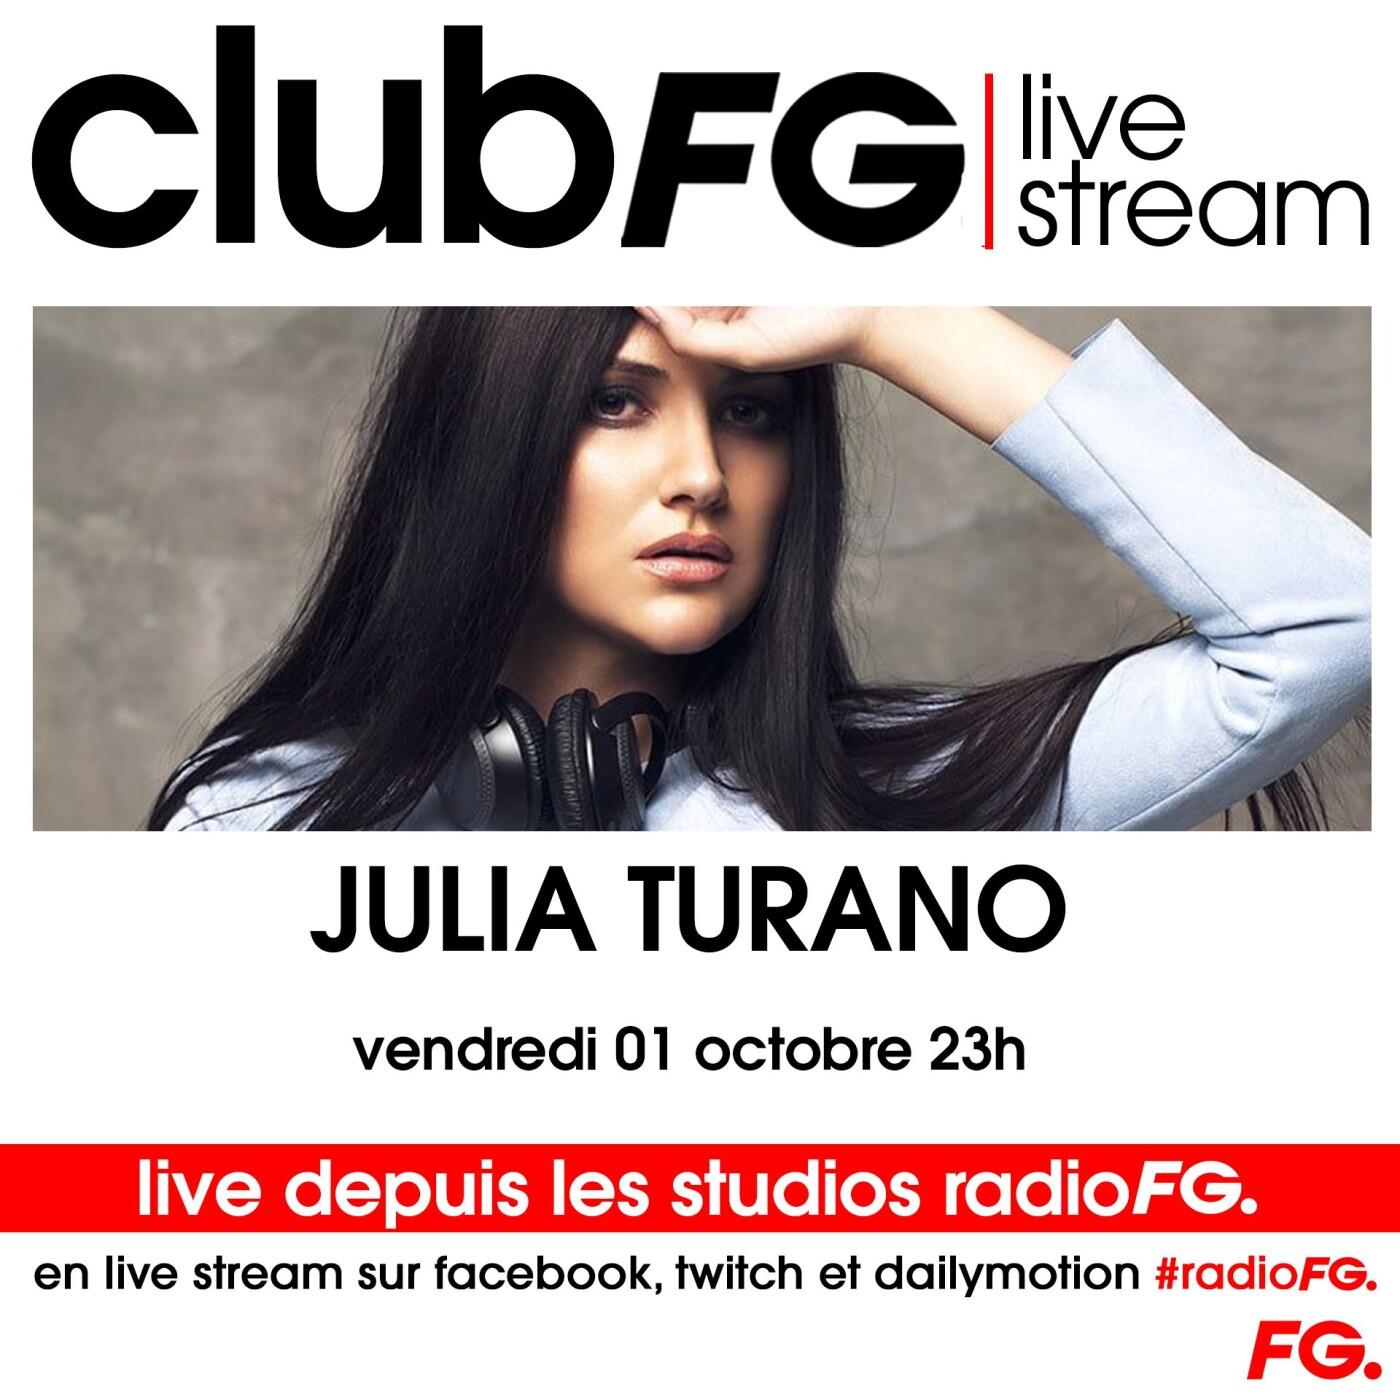 CLUB FG LIVE STREAM : JULIA TURANO